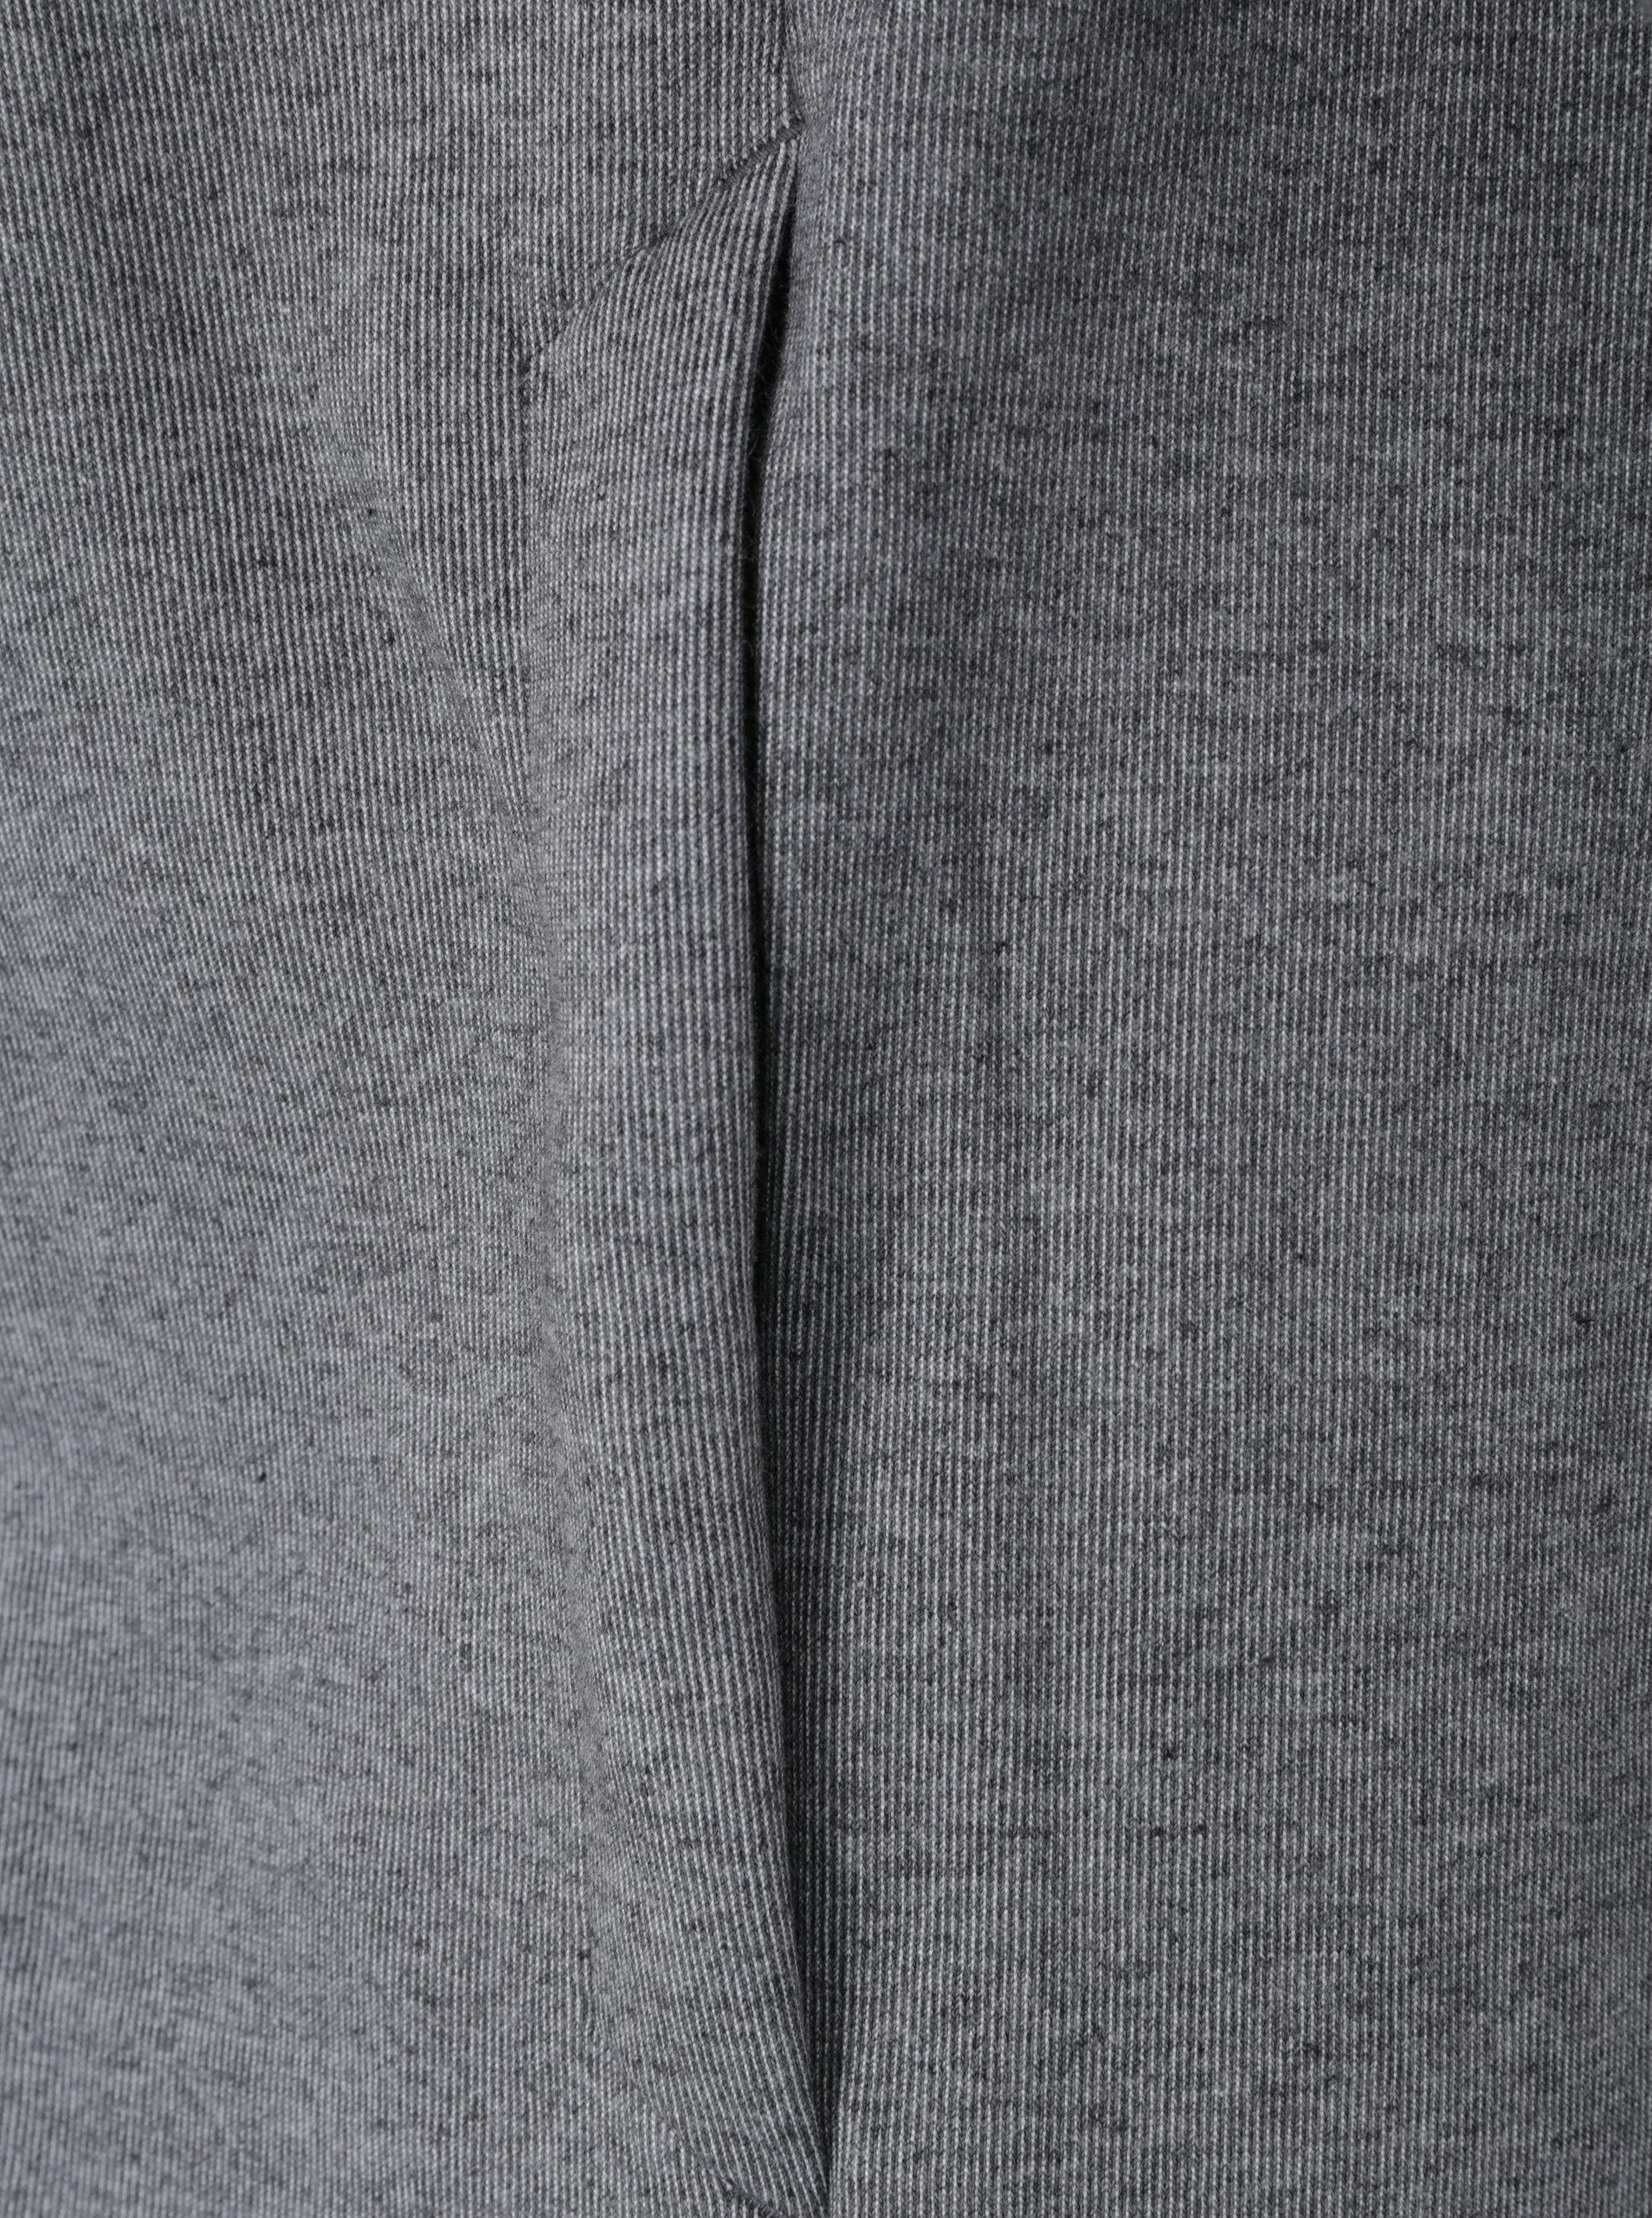 bceaa07f2a Čierno-sivá pánska mikina s kapucňou Nike NSW